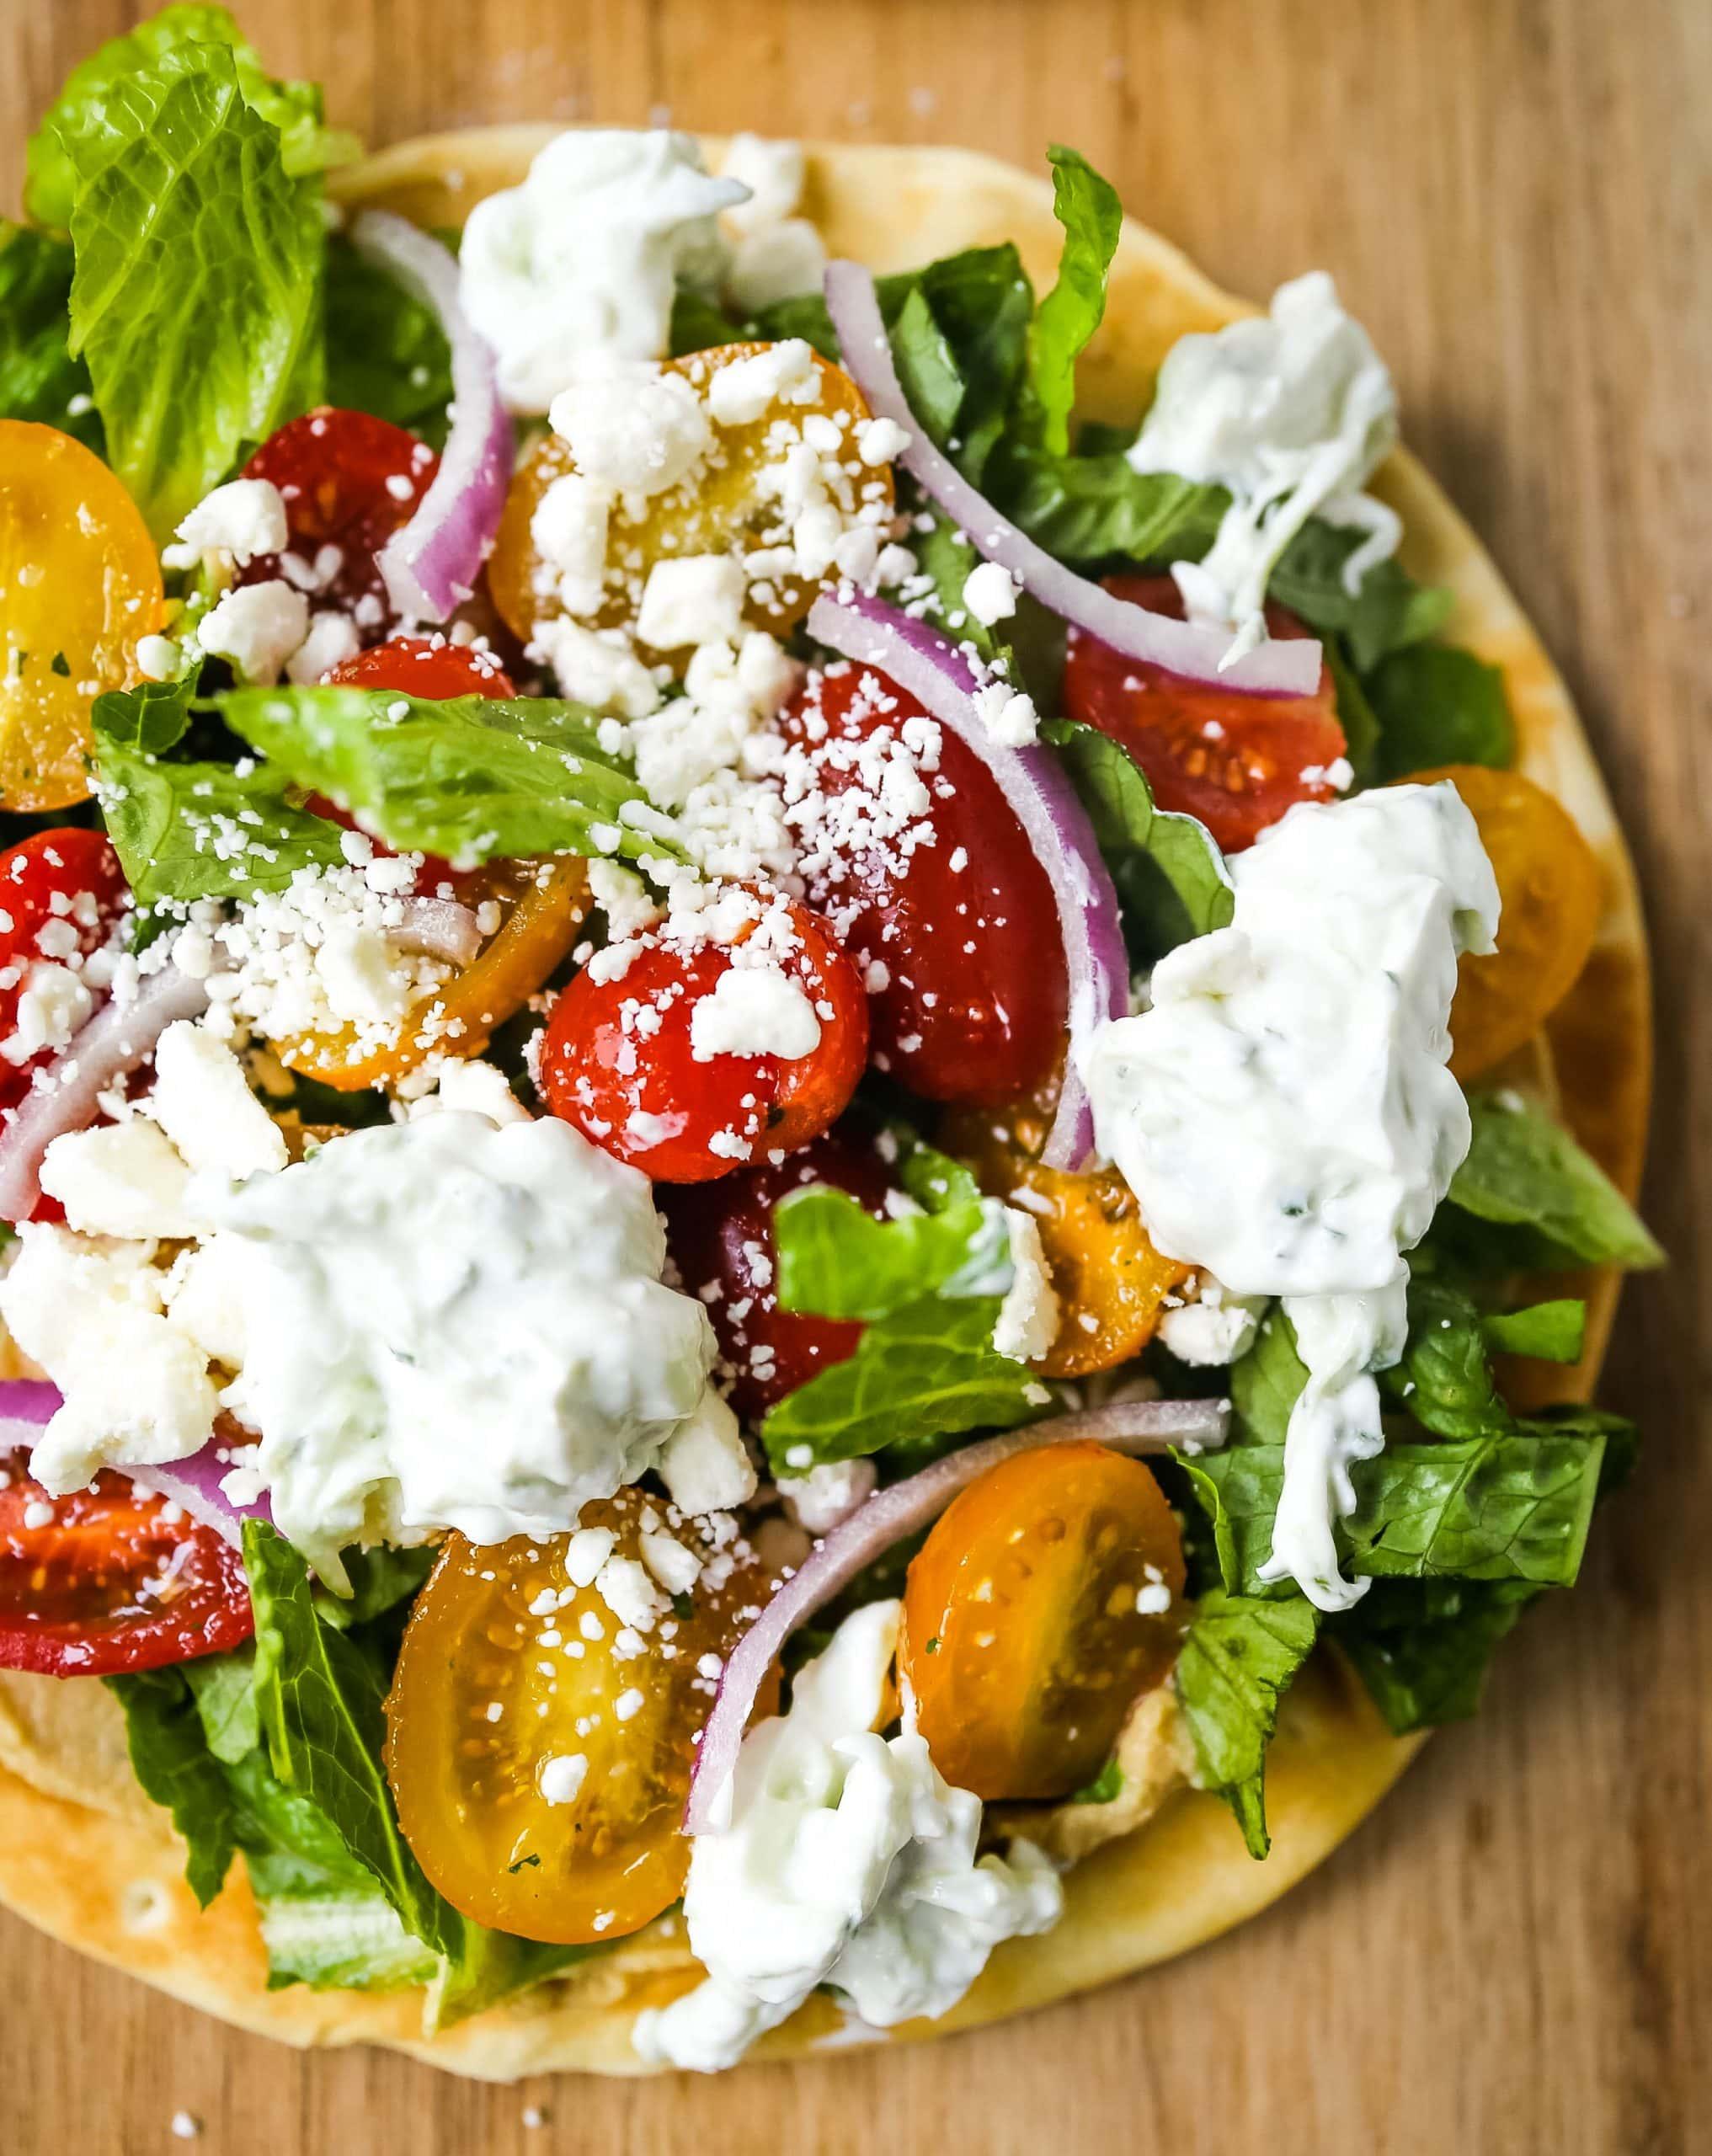 Greek Salad Pita Pizzas Soft pita bread topped with creamy hummus, romaine lettuce, juicy grape tomatoes, feta cheese, red onion, cucumber, and a homemade fresh tzatziki sauce.www.modernhoney.com #greek #greekfood #salad #pita